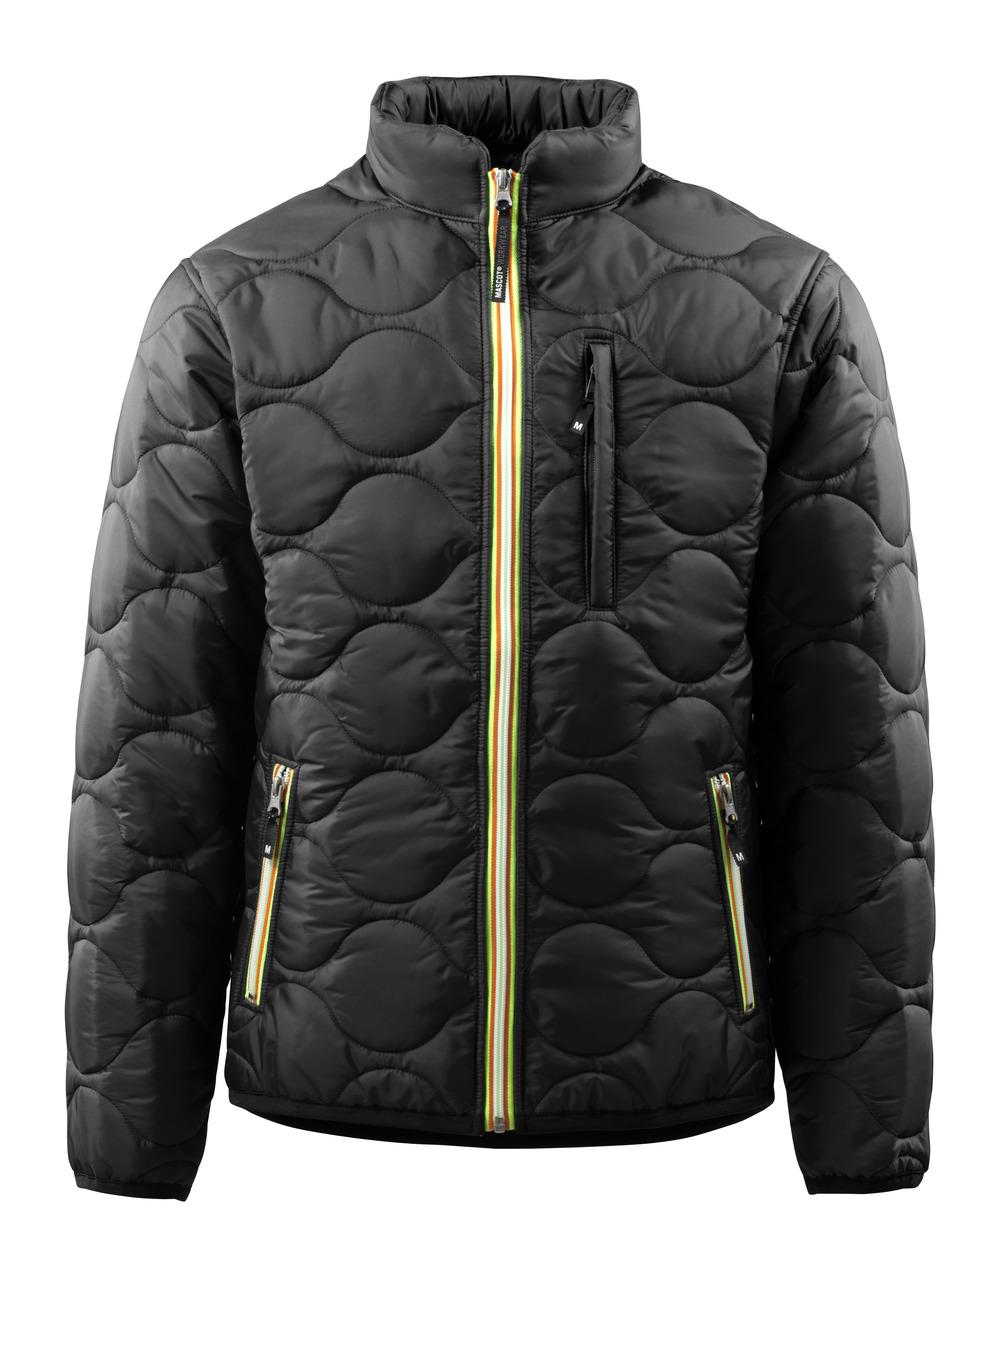 15015-998-09 Thermojack - zwart